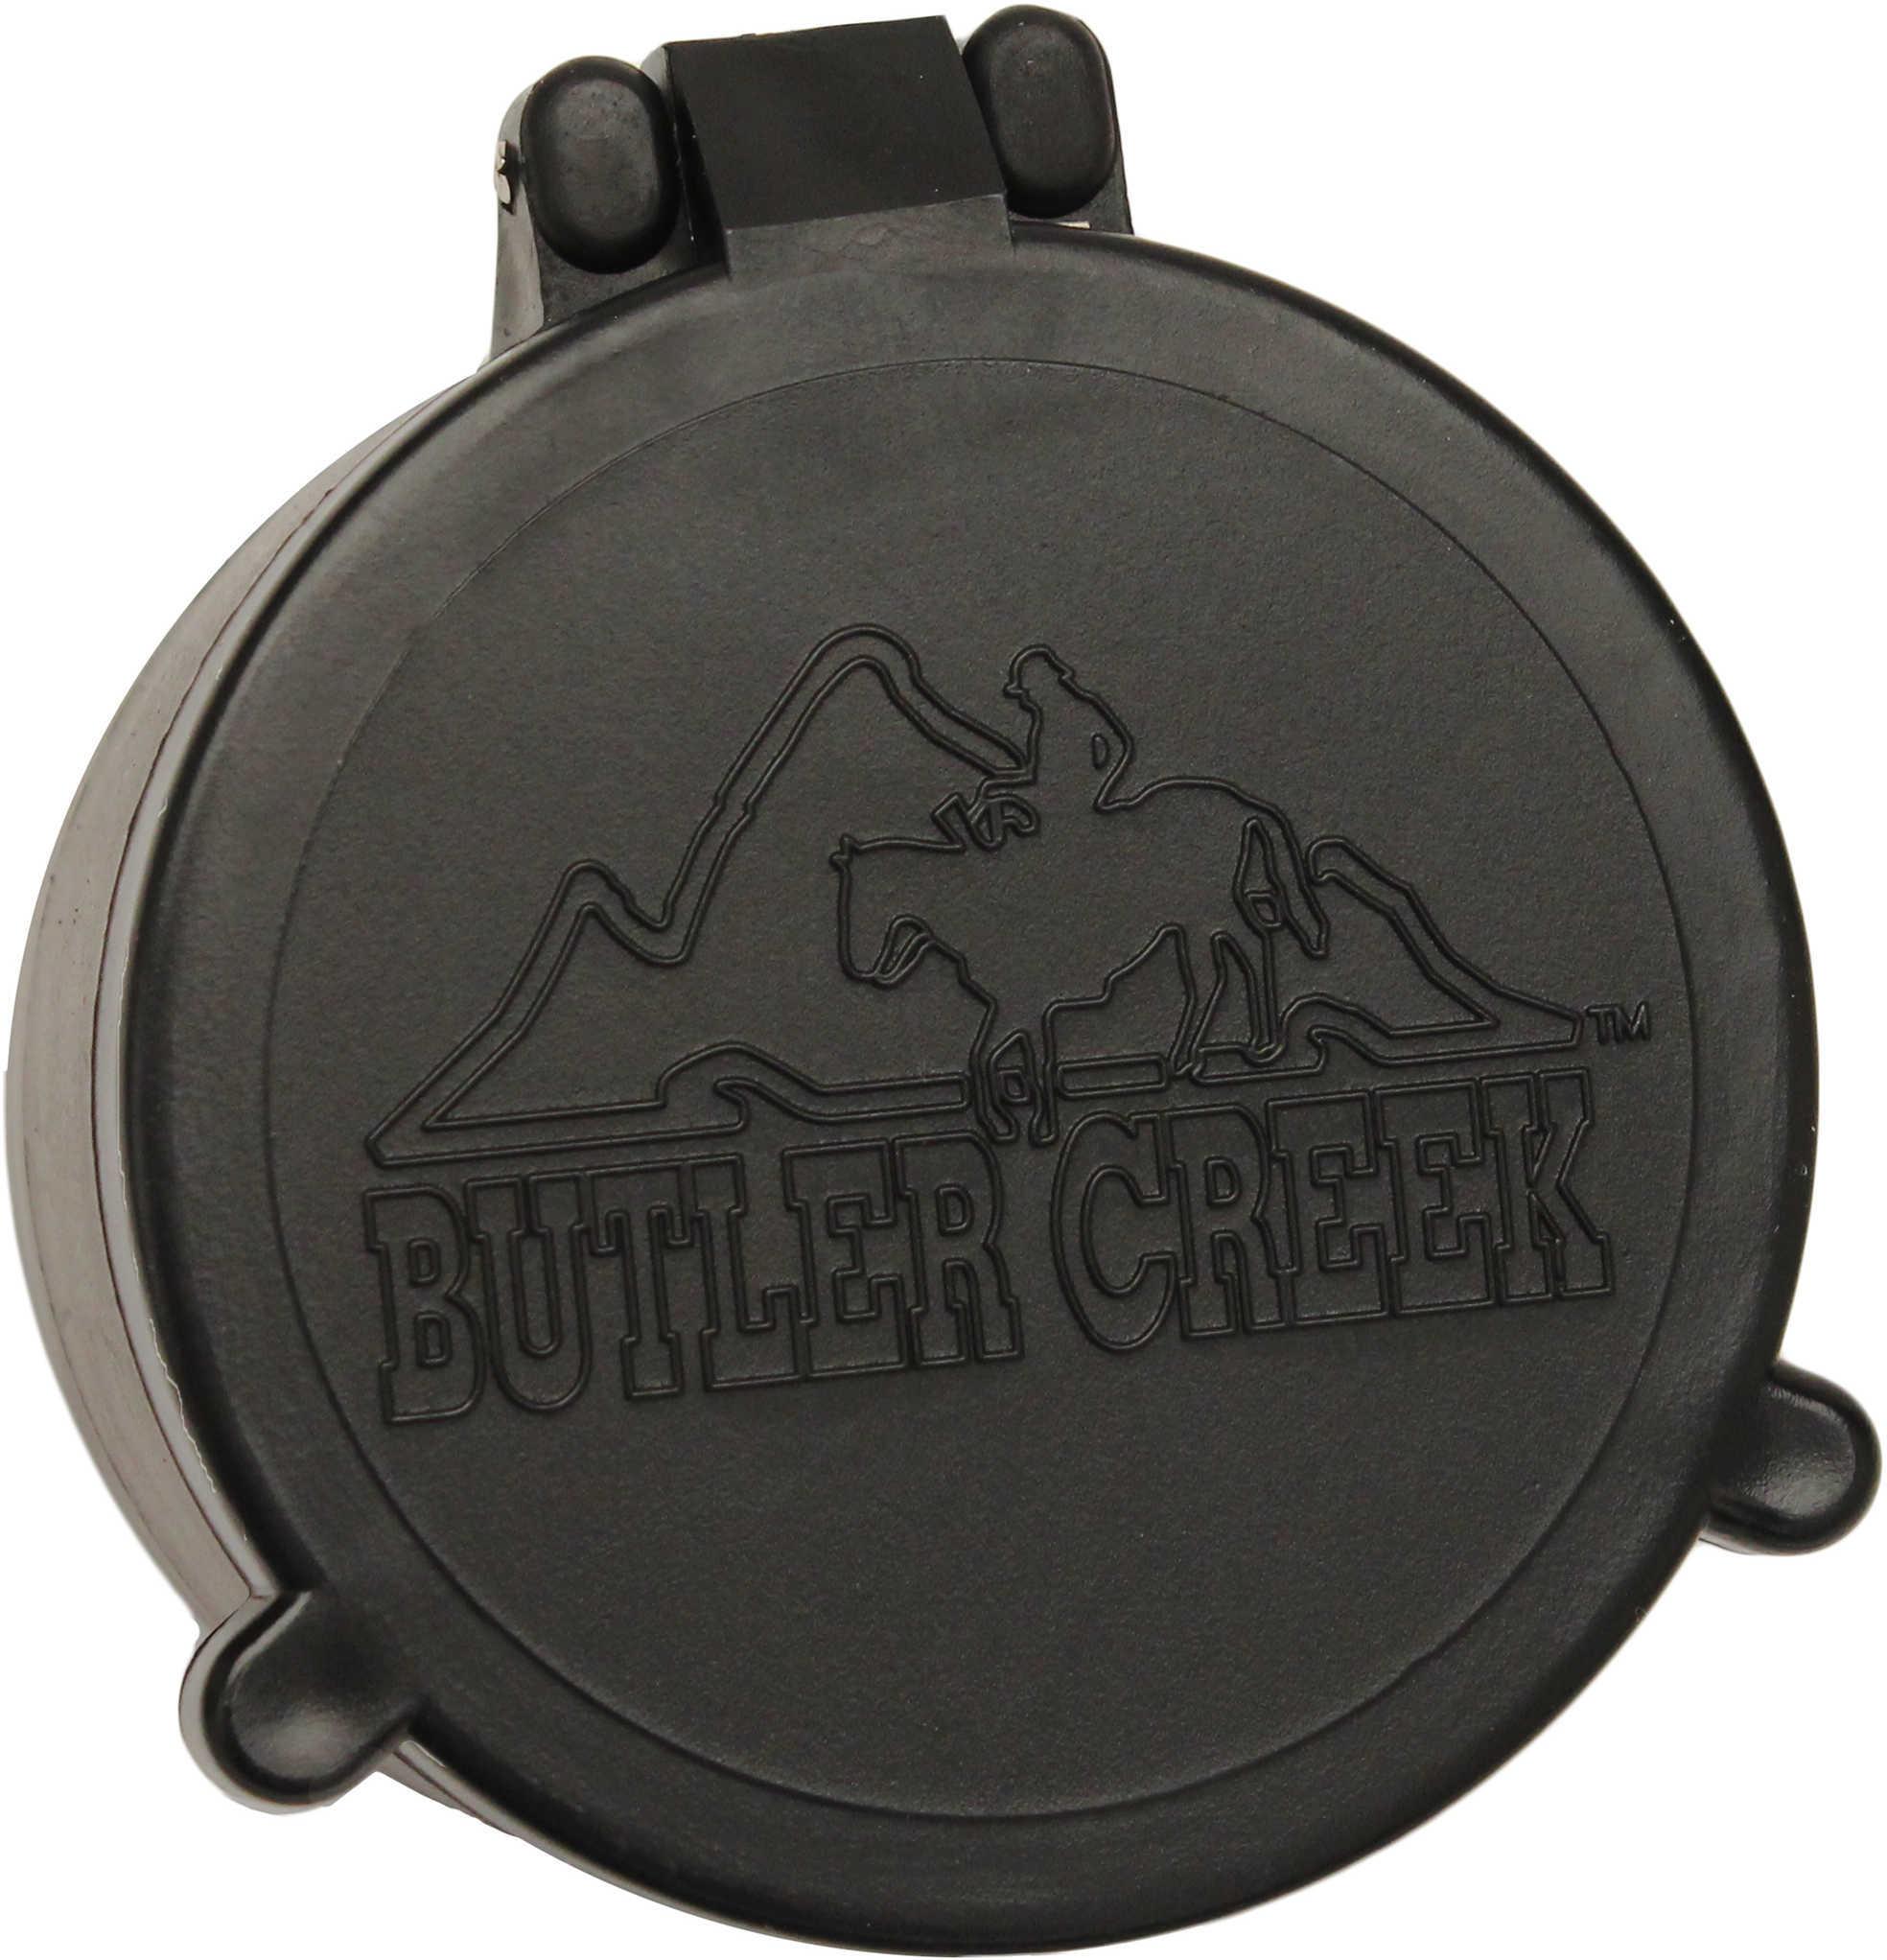 Butler Creek Flip Open Scope Cover - Objective Size 30 Md: 30300